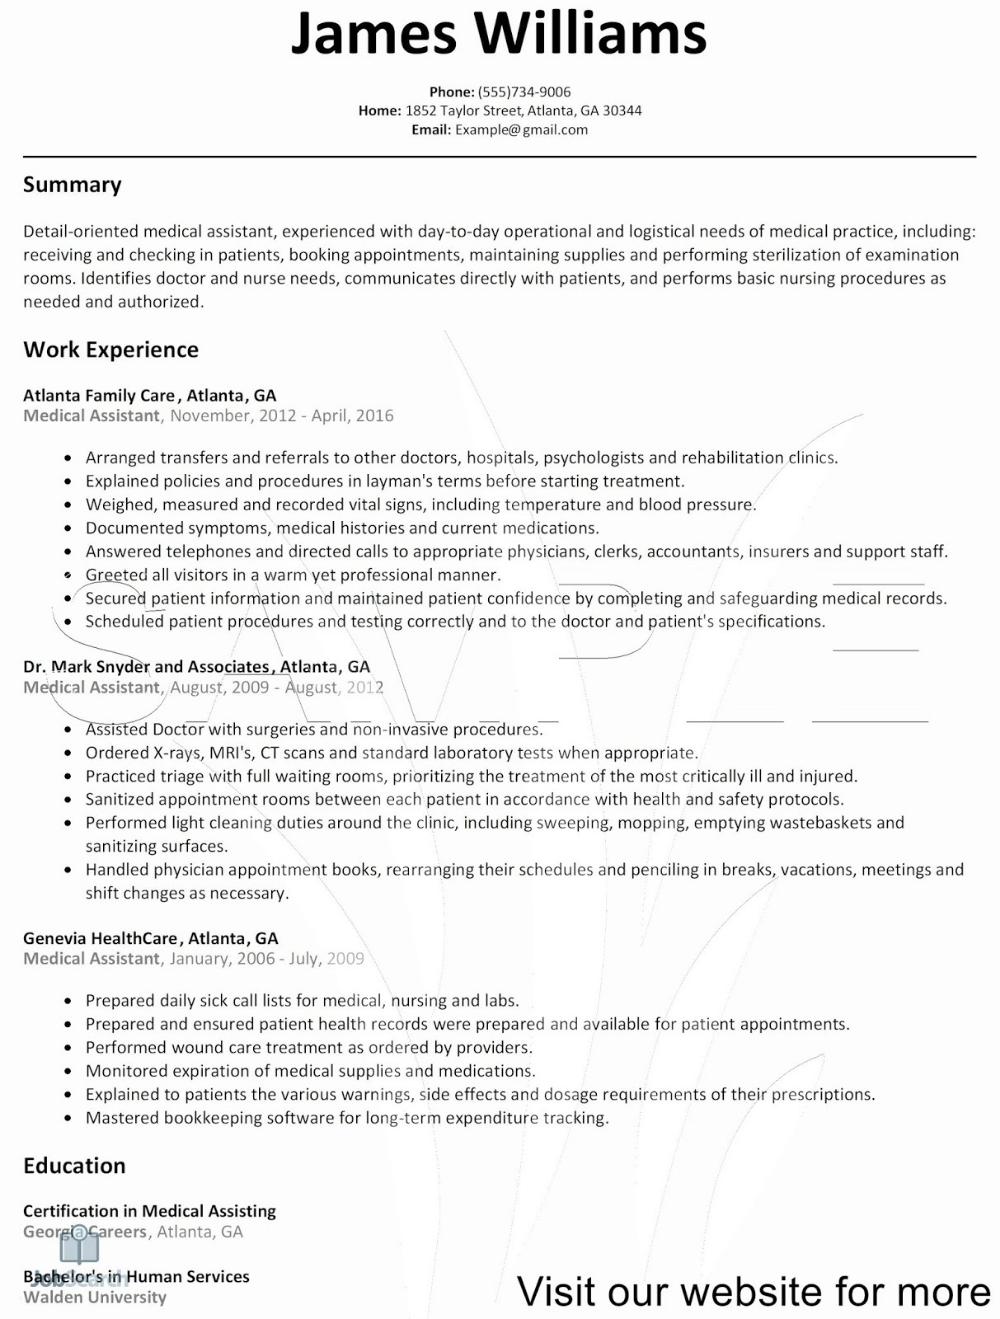 Resume Templates Australia Online